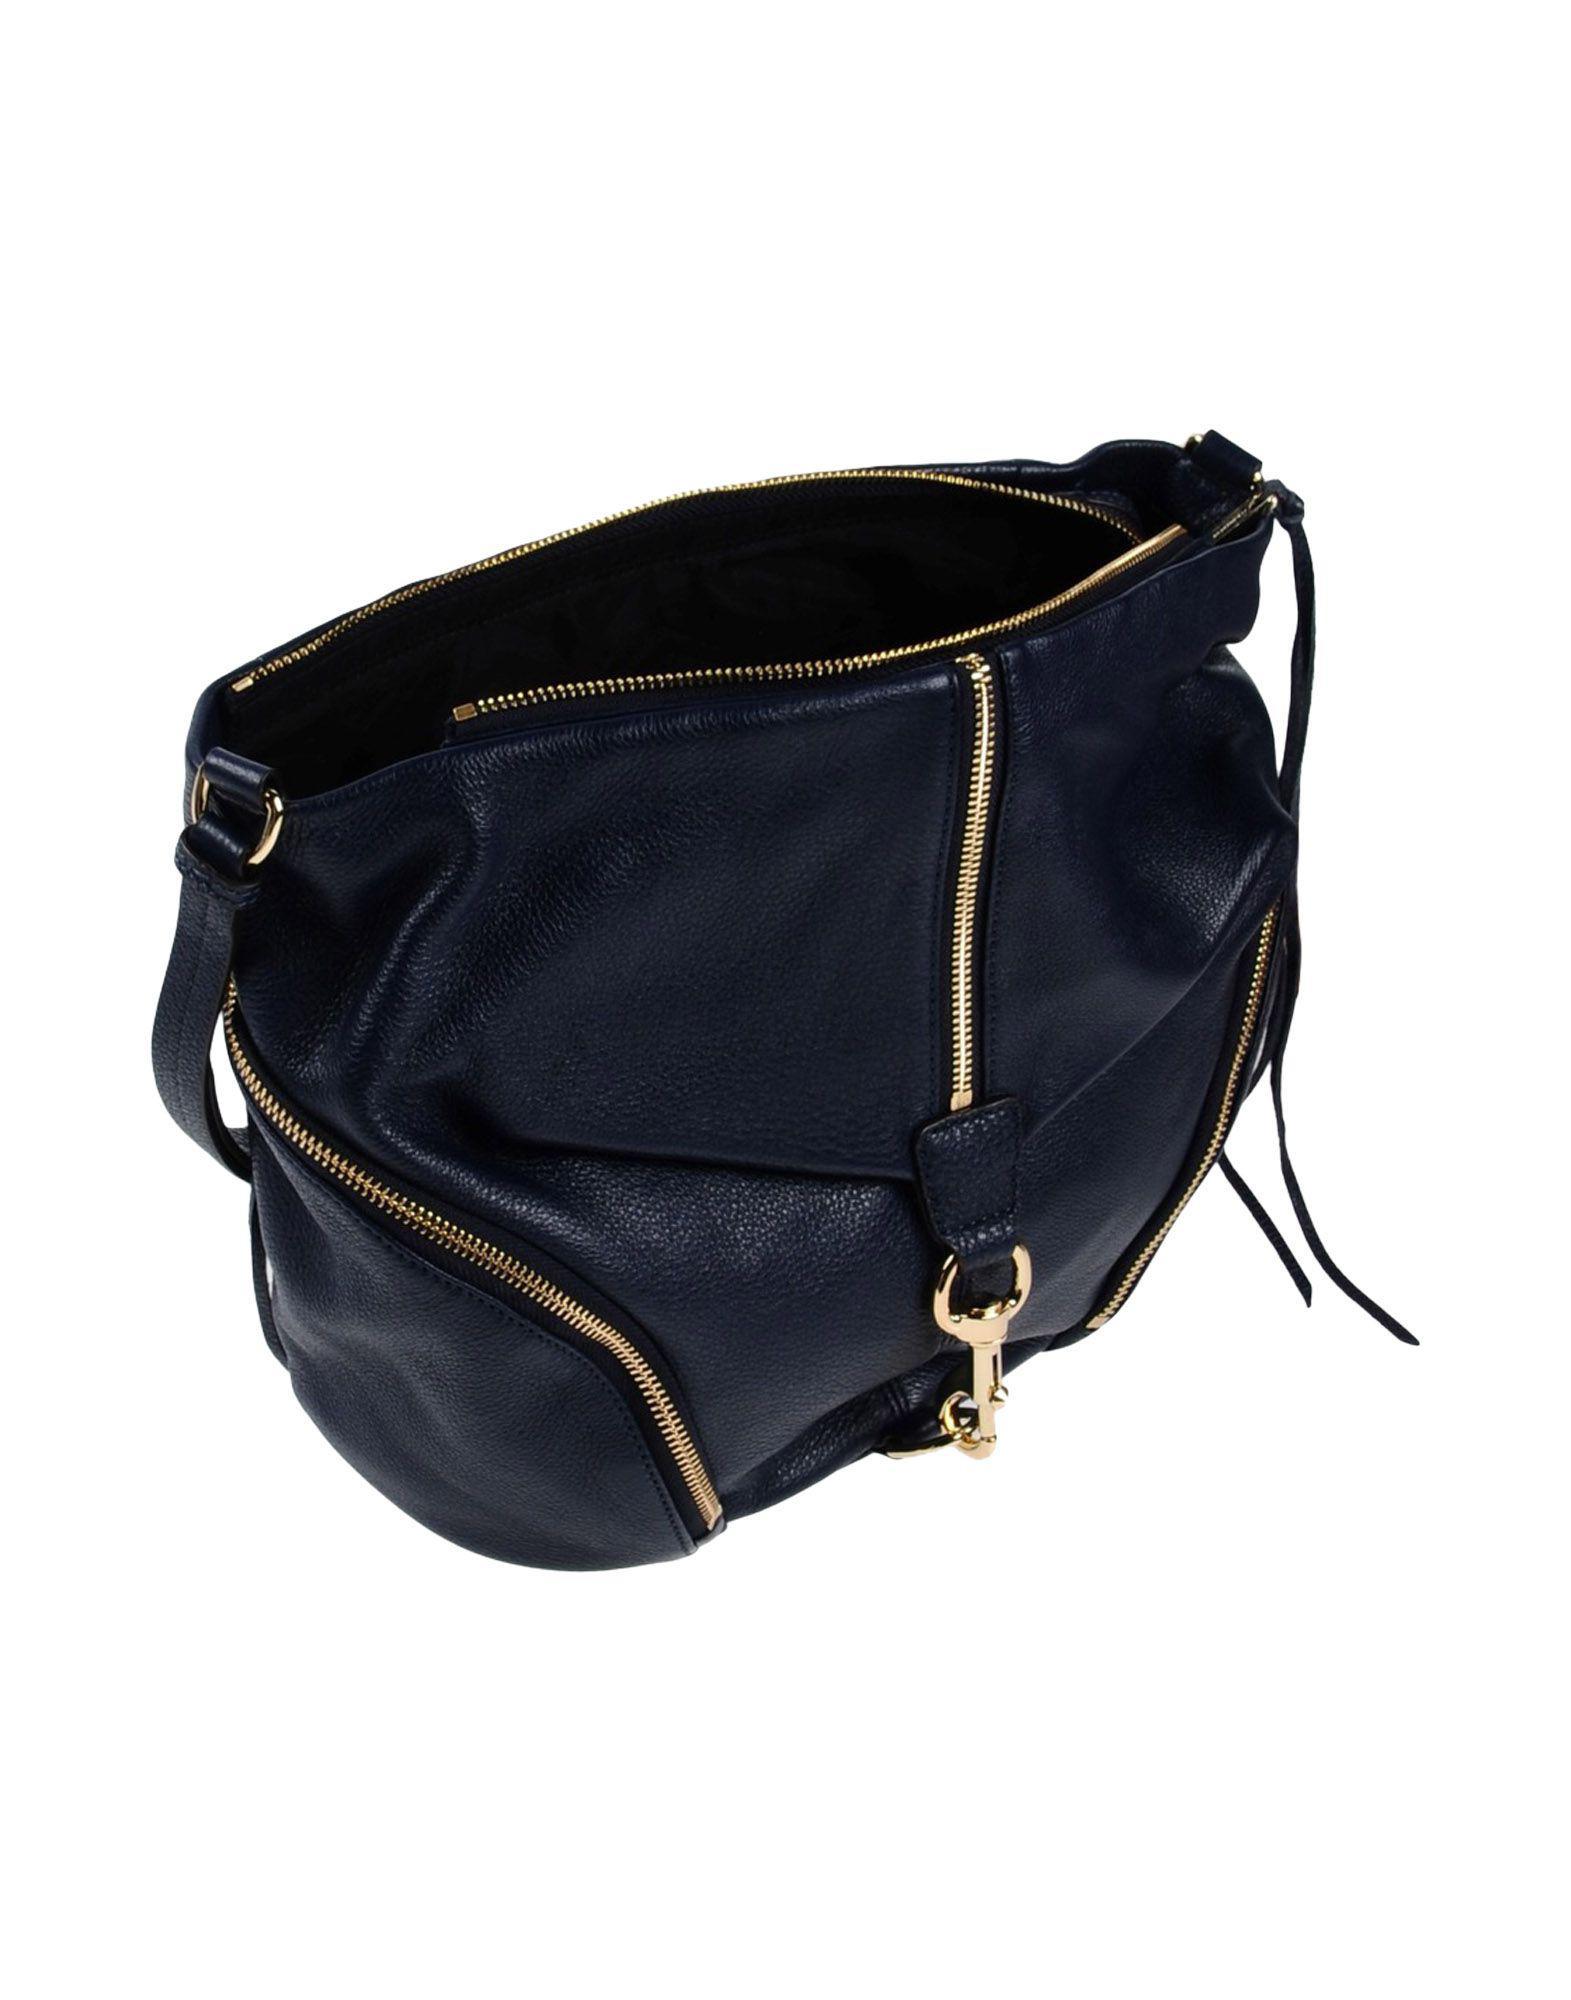 Rebecca Minkoff Leather Cross-body Bag in Dark Blue (Blue)